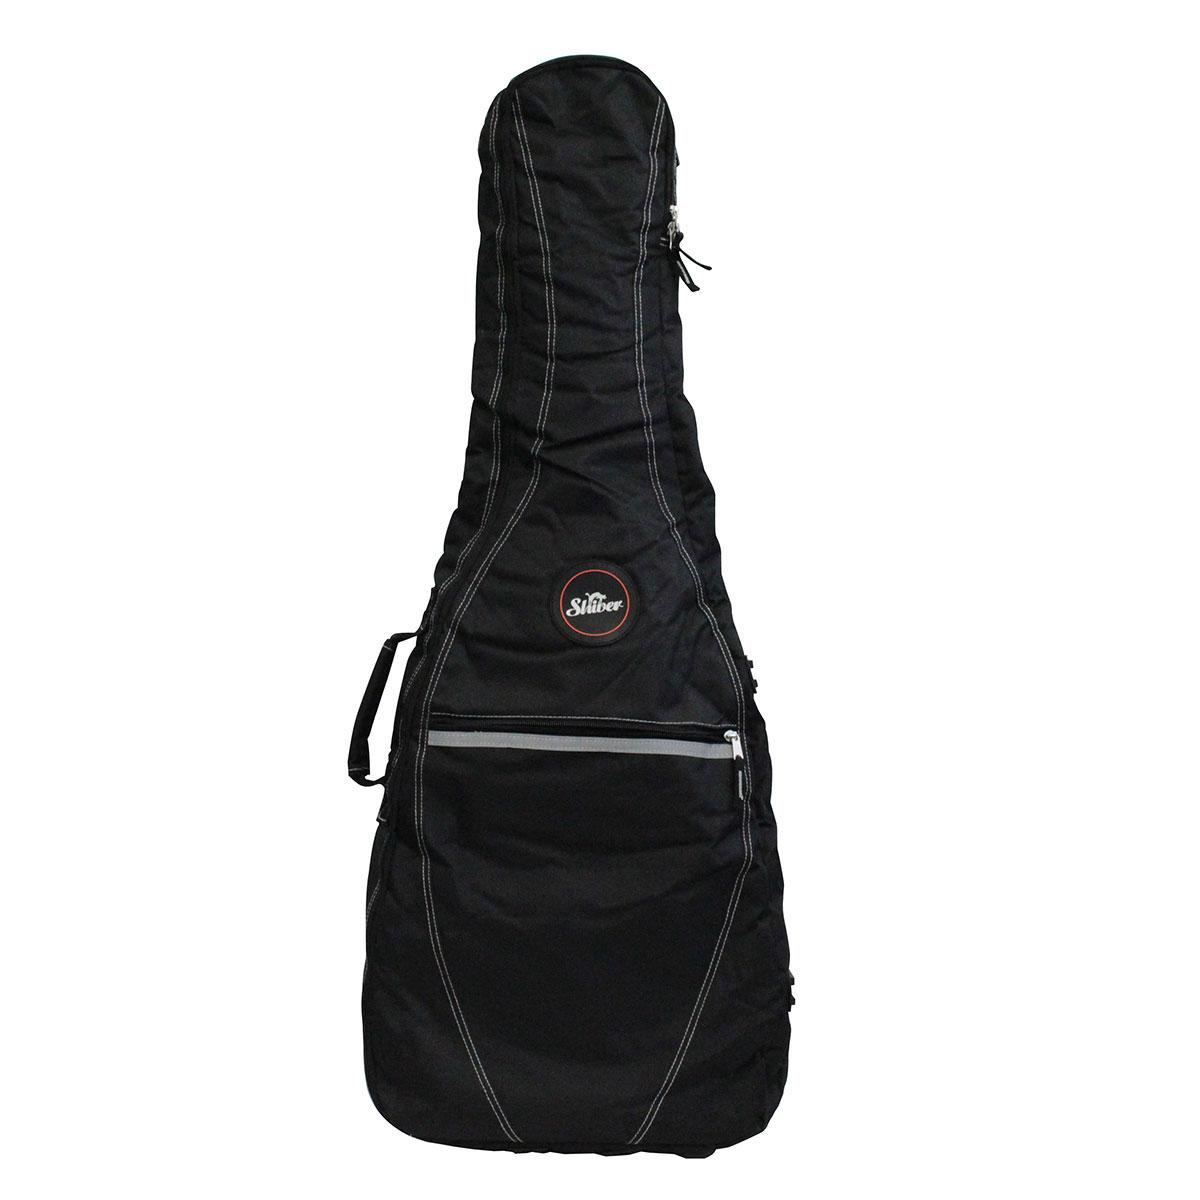 Shiver - Housse guitare classique 1/2 - 3/4 standard